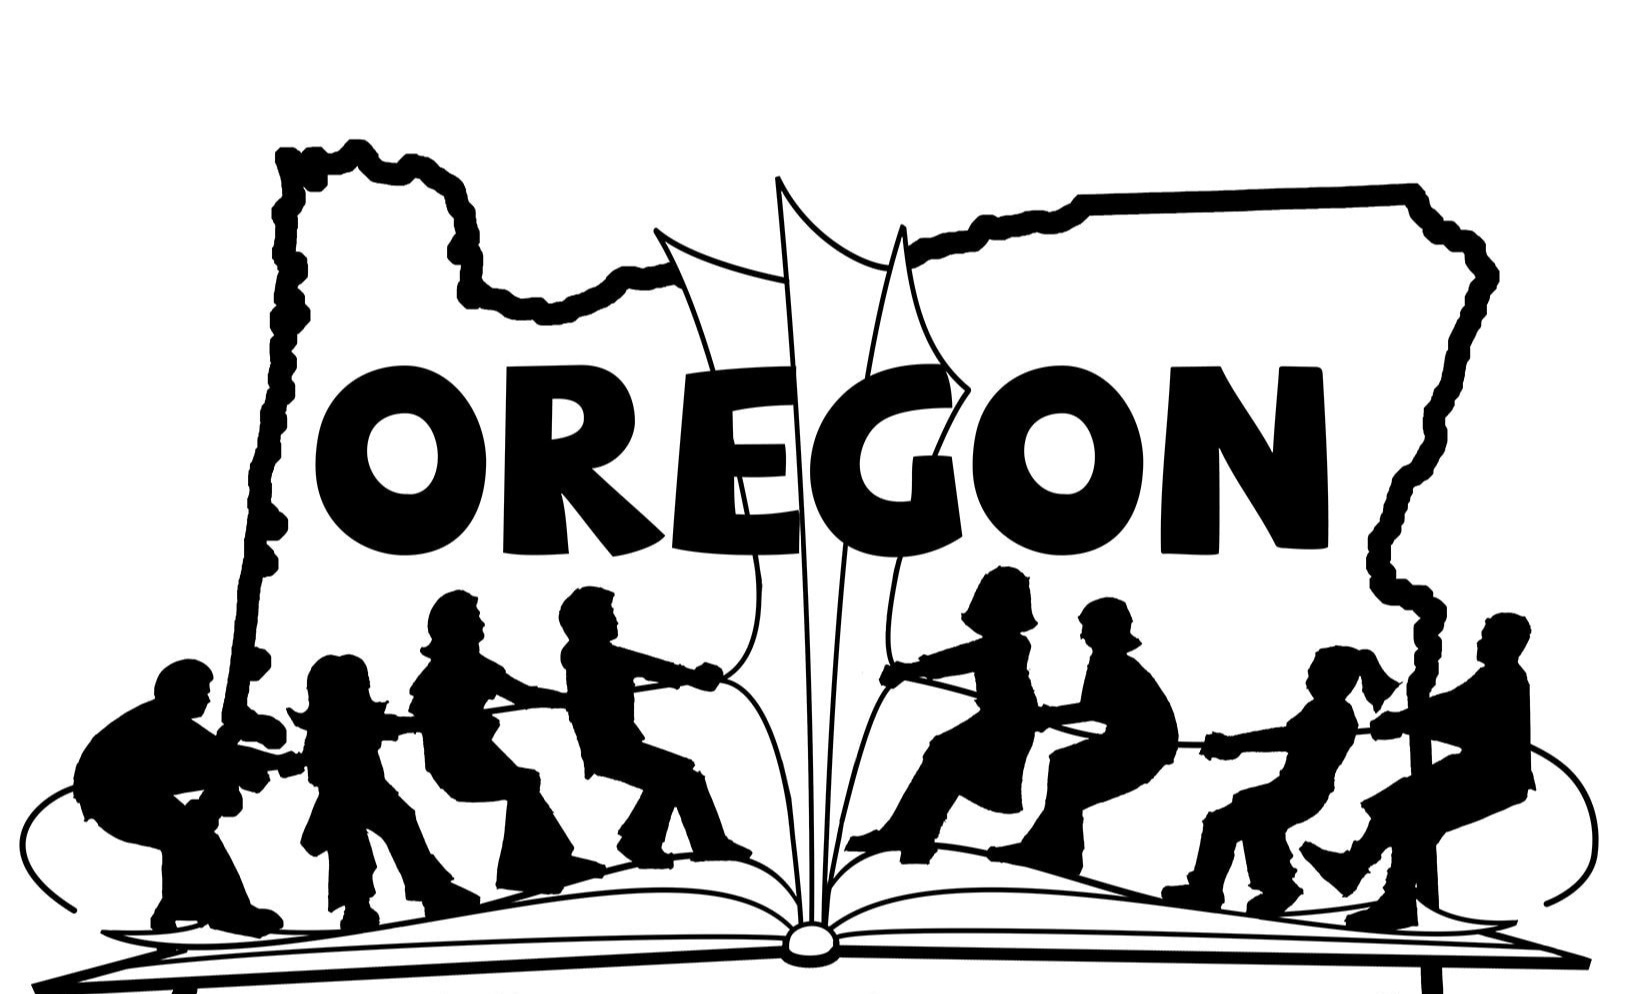 oregon battle of books